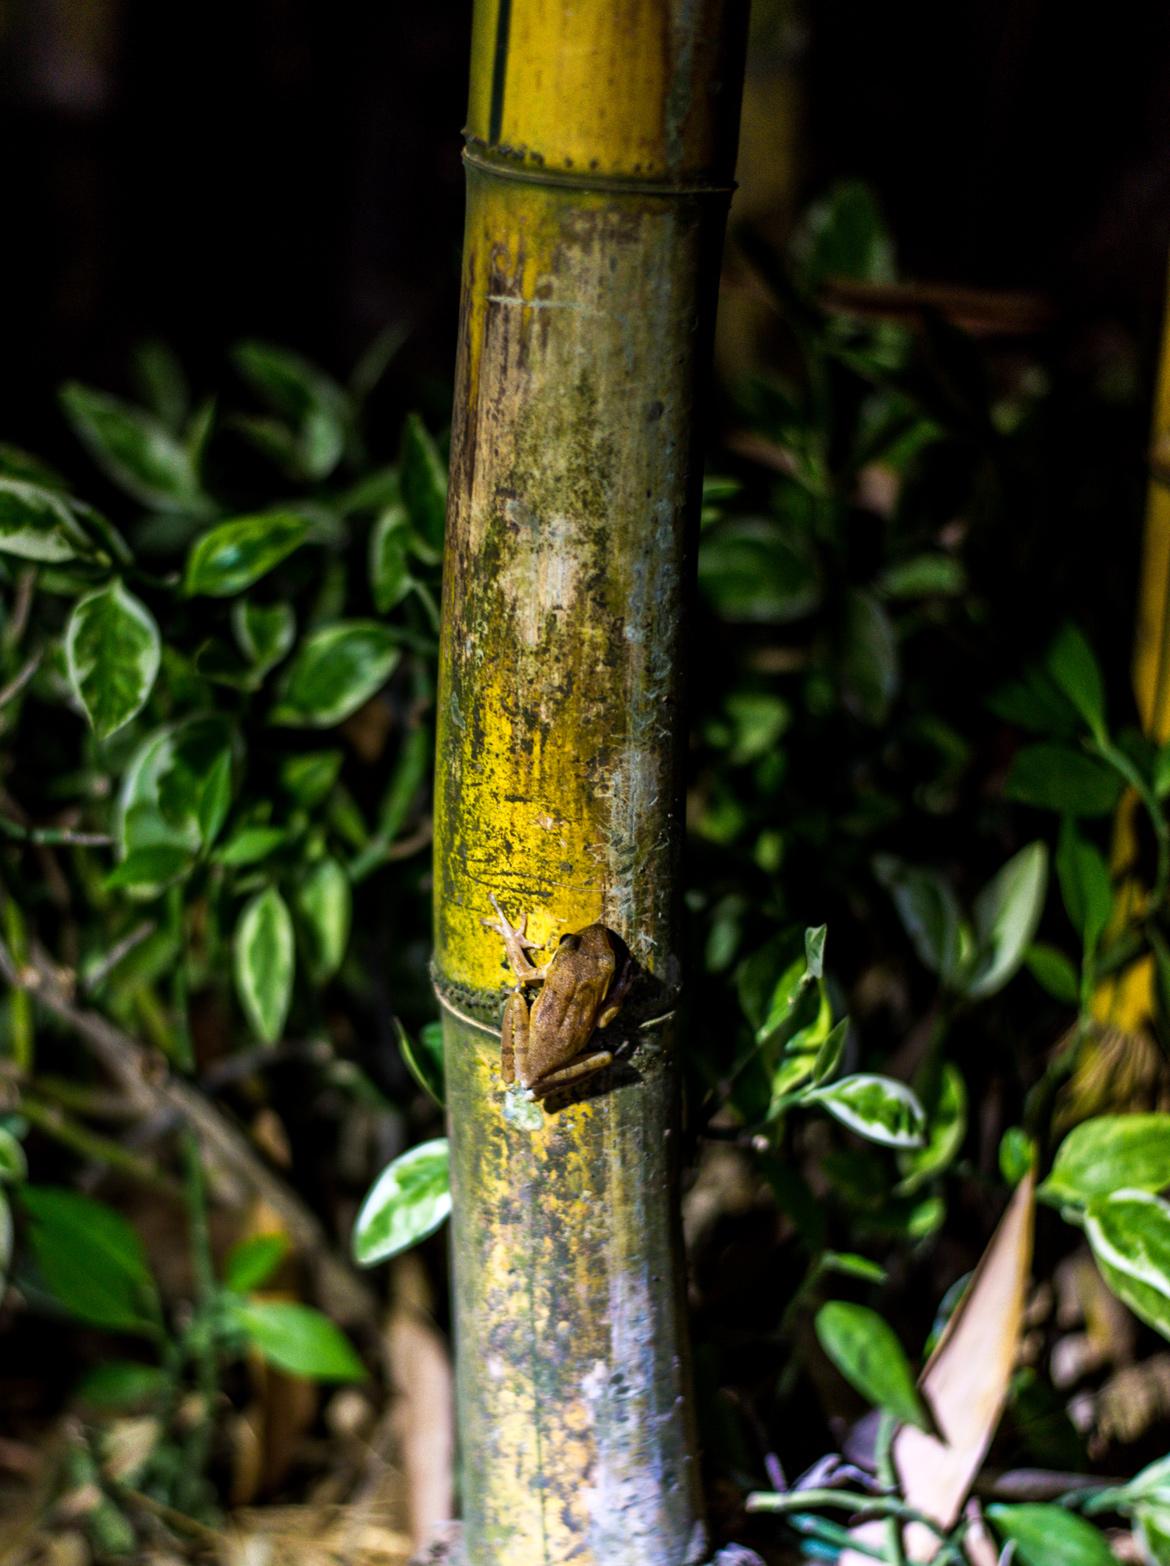 A frog climbs a bamboo.